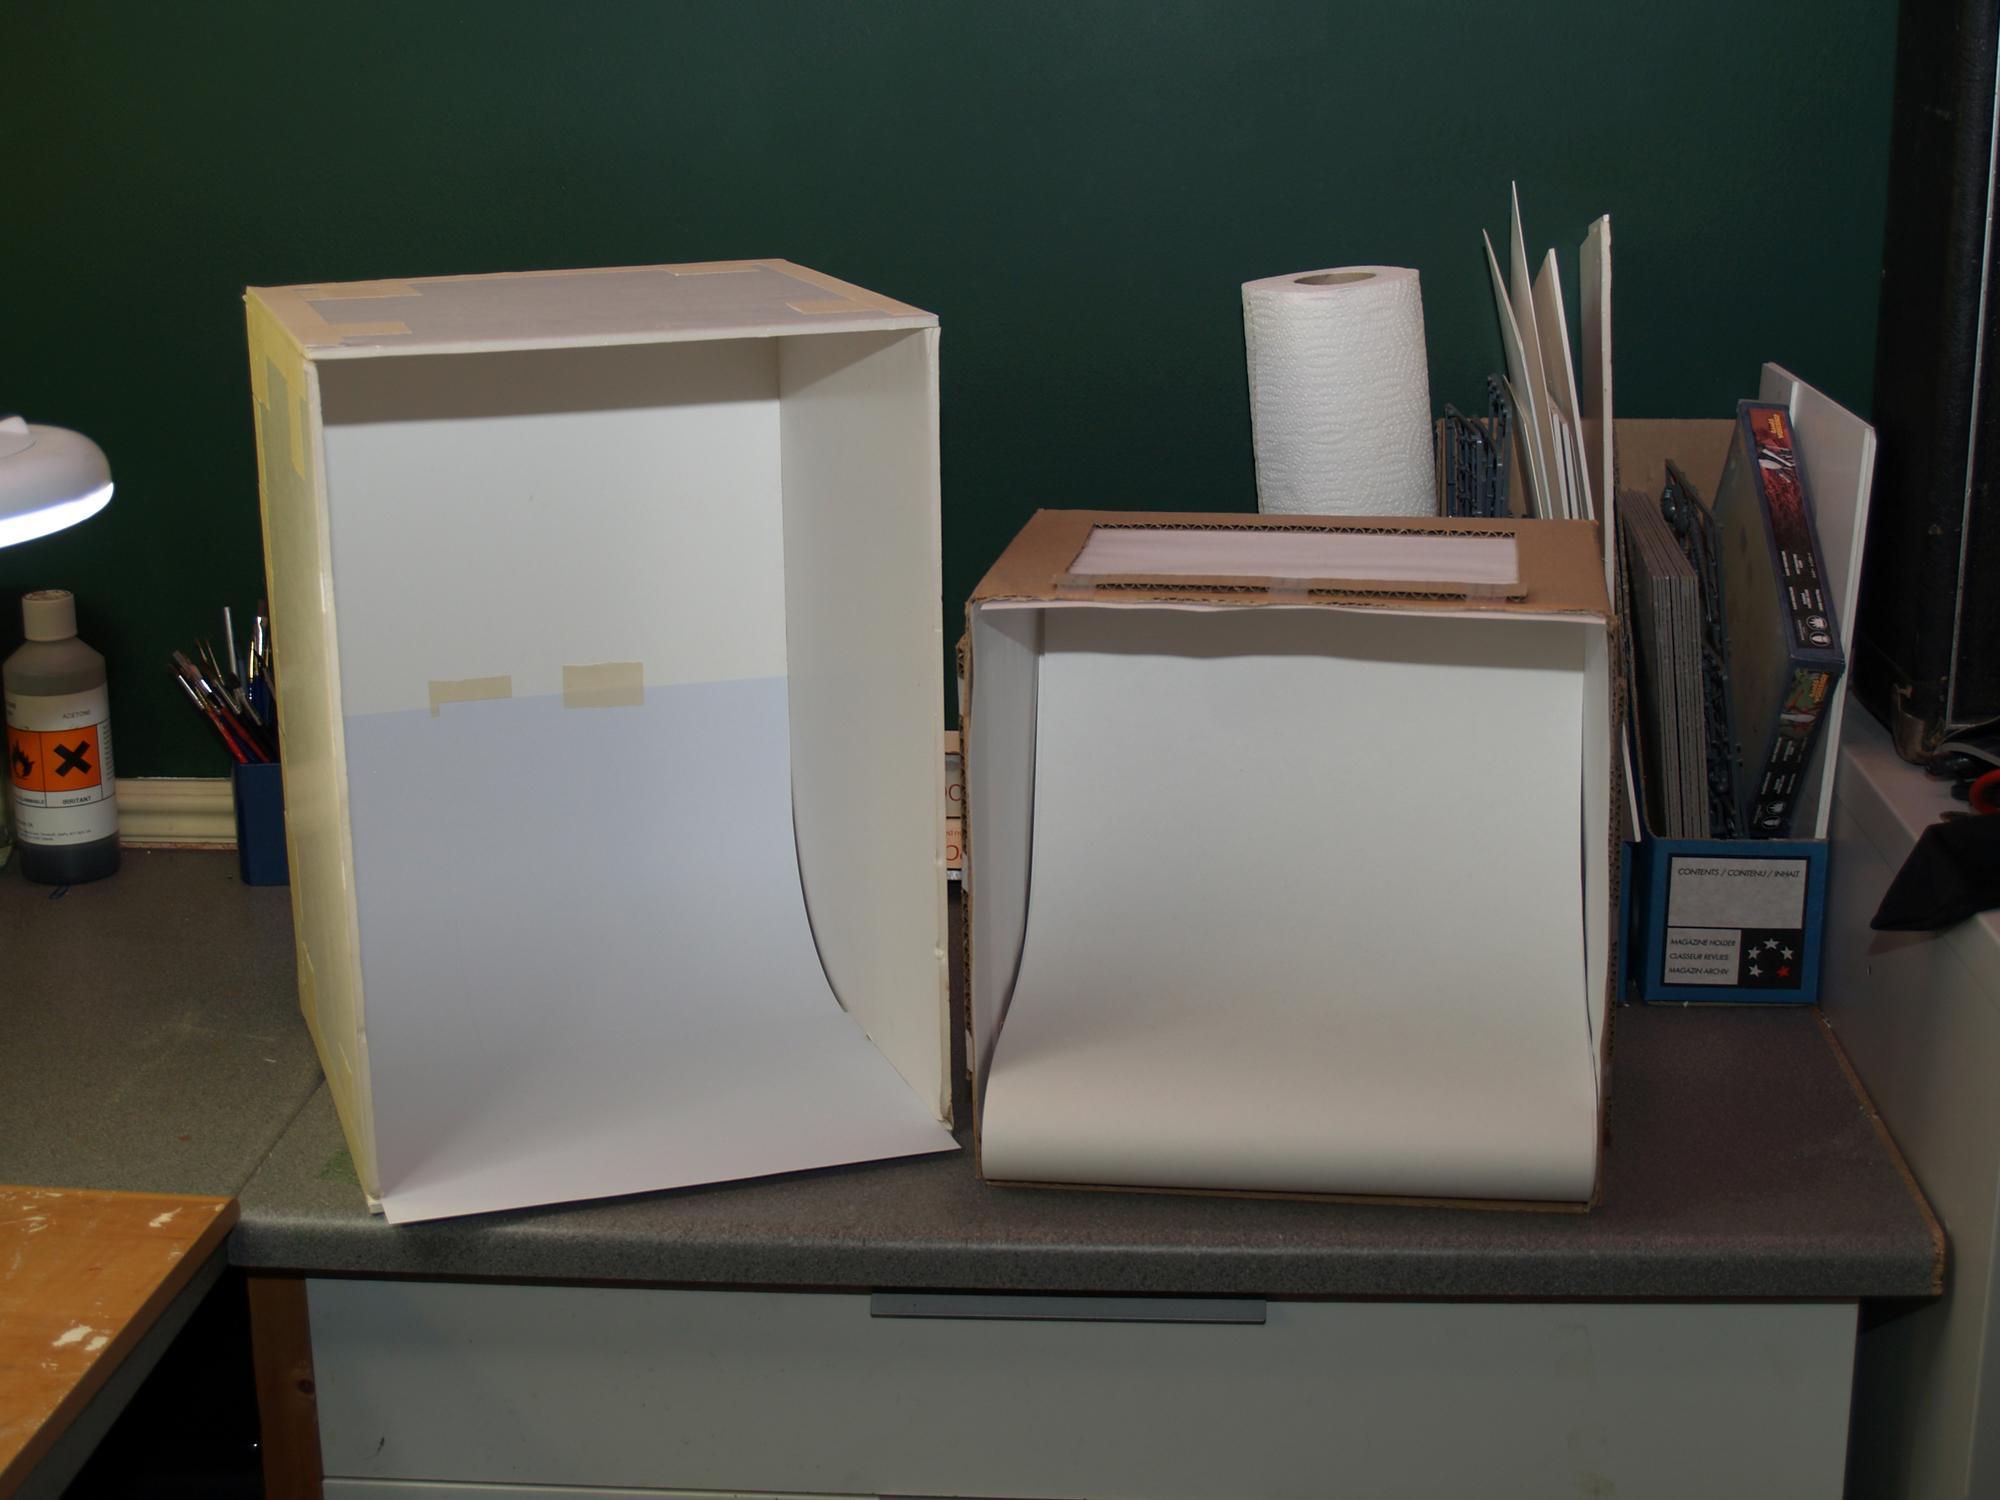 Box, Light, Lightbox, Photo